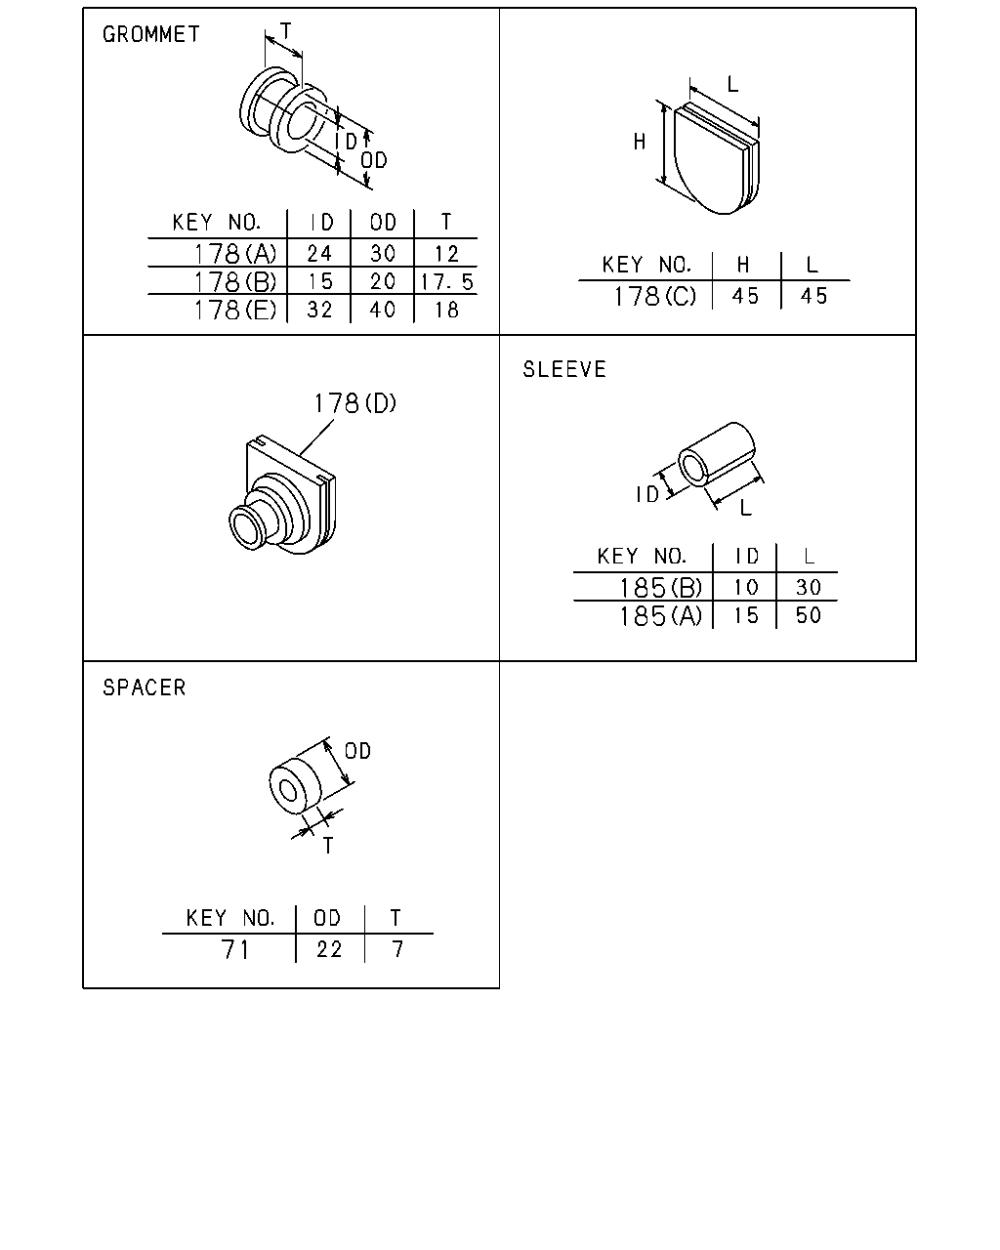 medium resolution of wiring diagram grommet key wiring diagrams scematic rh 51 jessicadonath de wiring diagram symbols ge wiring diagram symbol key